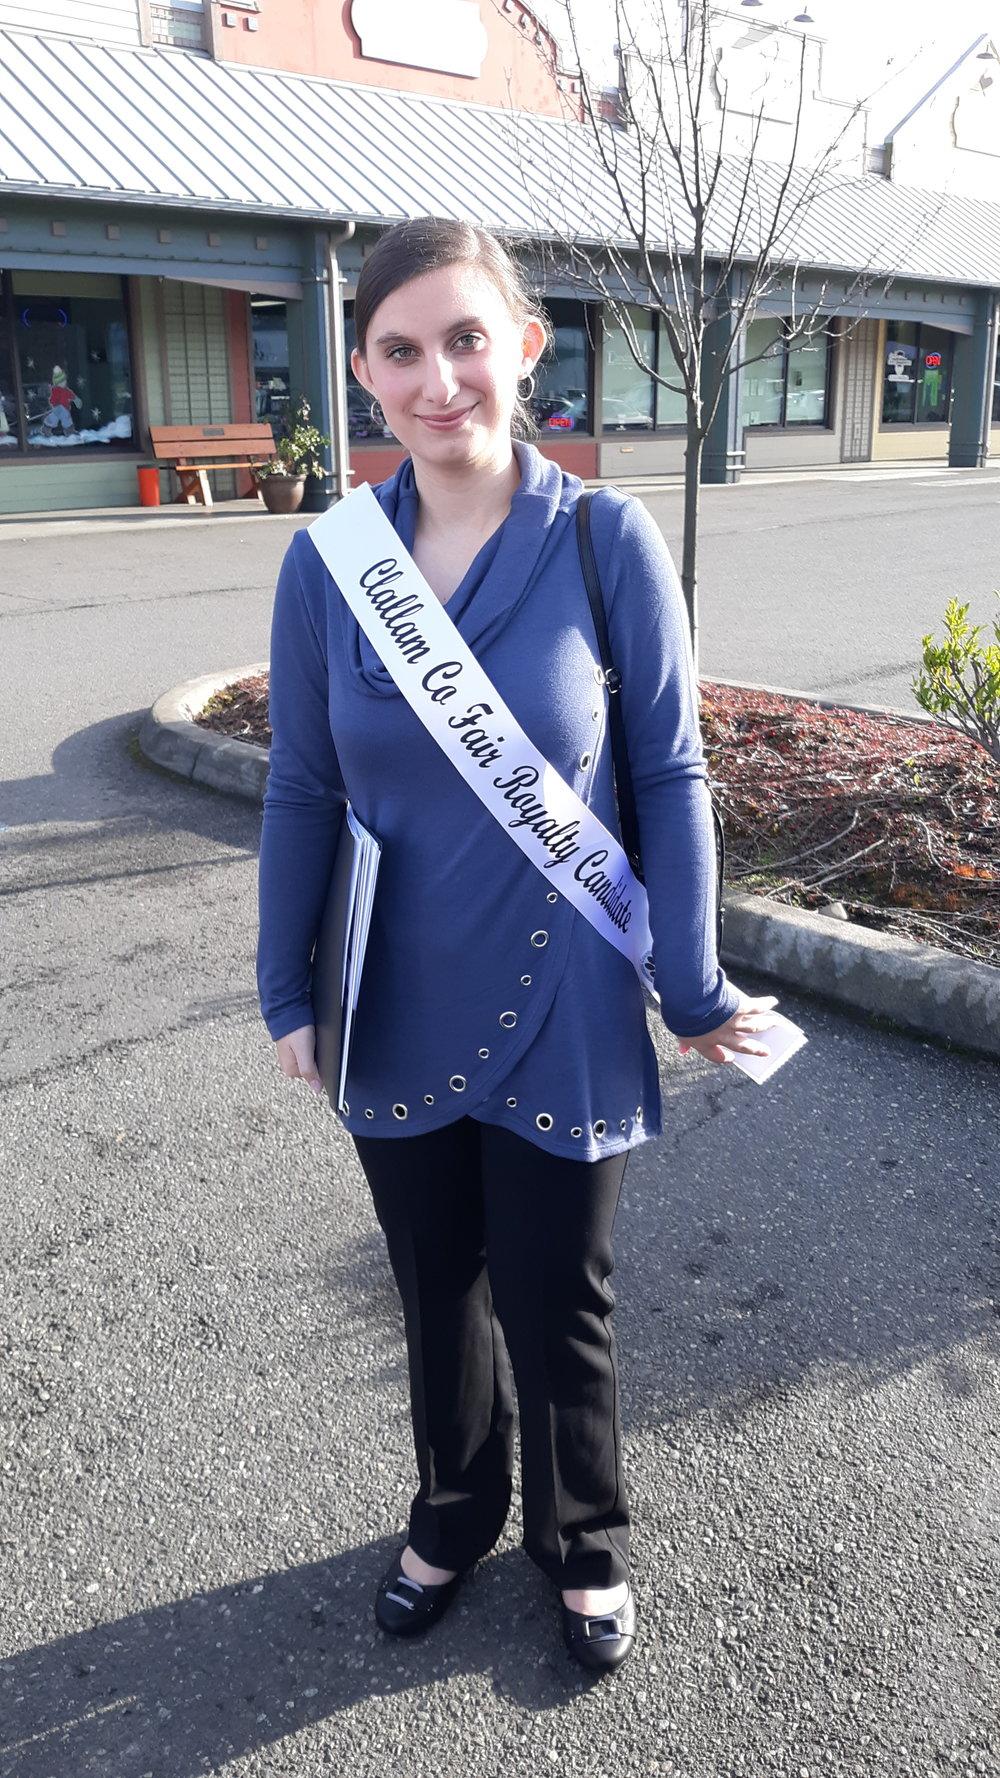 Rebekah Parker Clallam County Fair Royalty